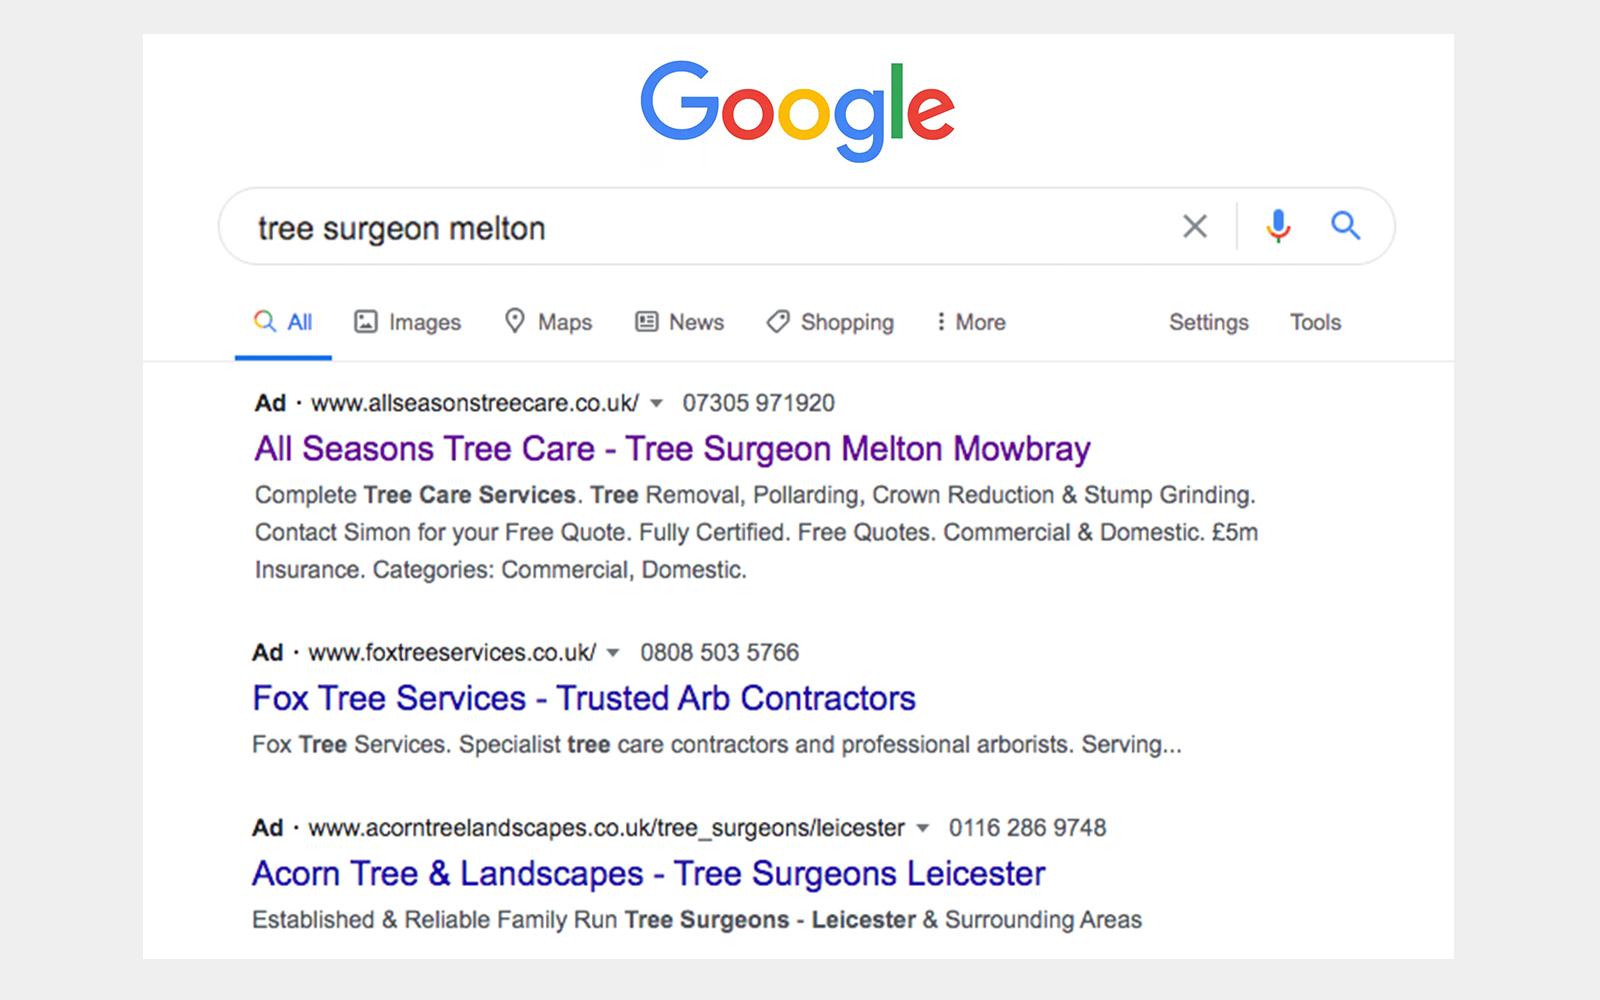 Google ads setup and supporrt